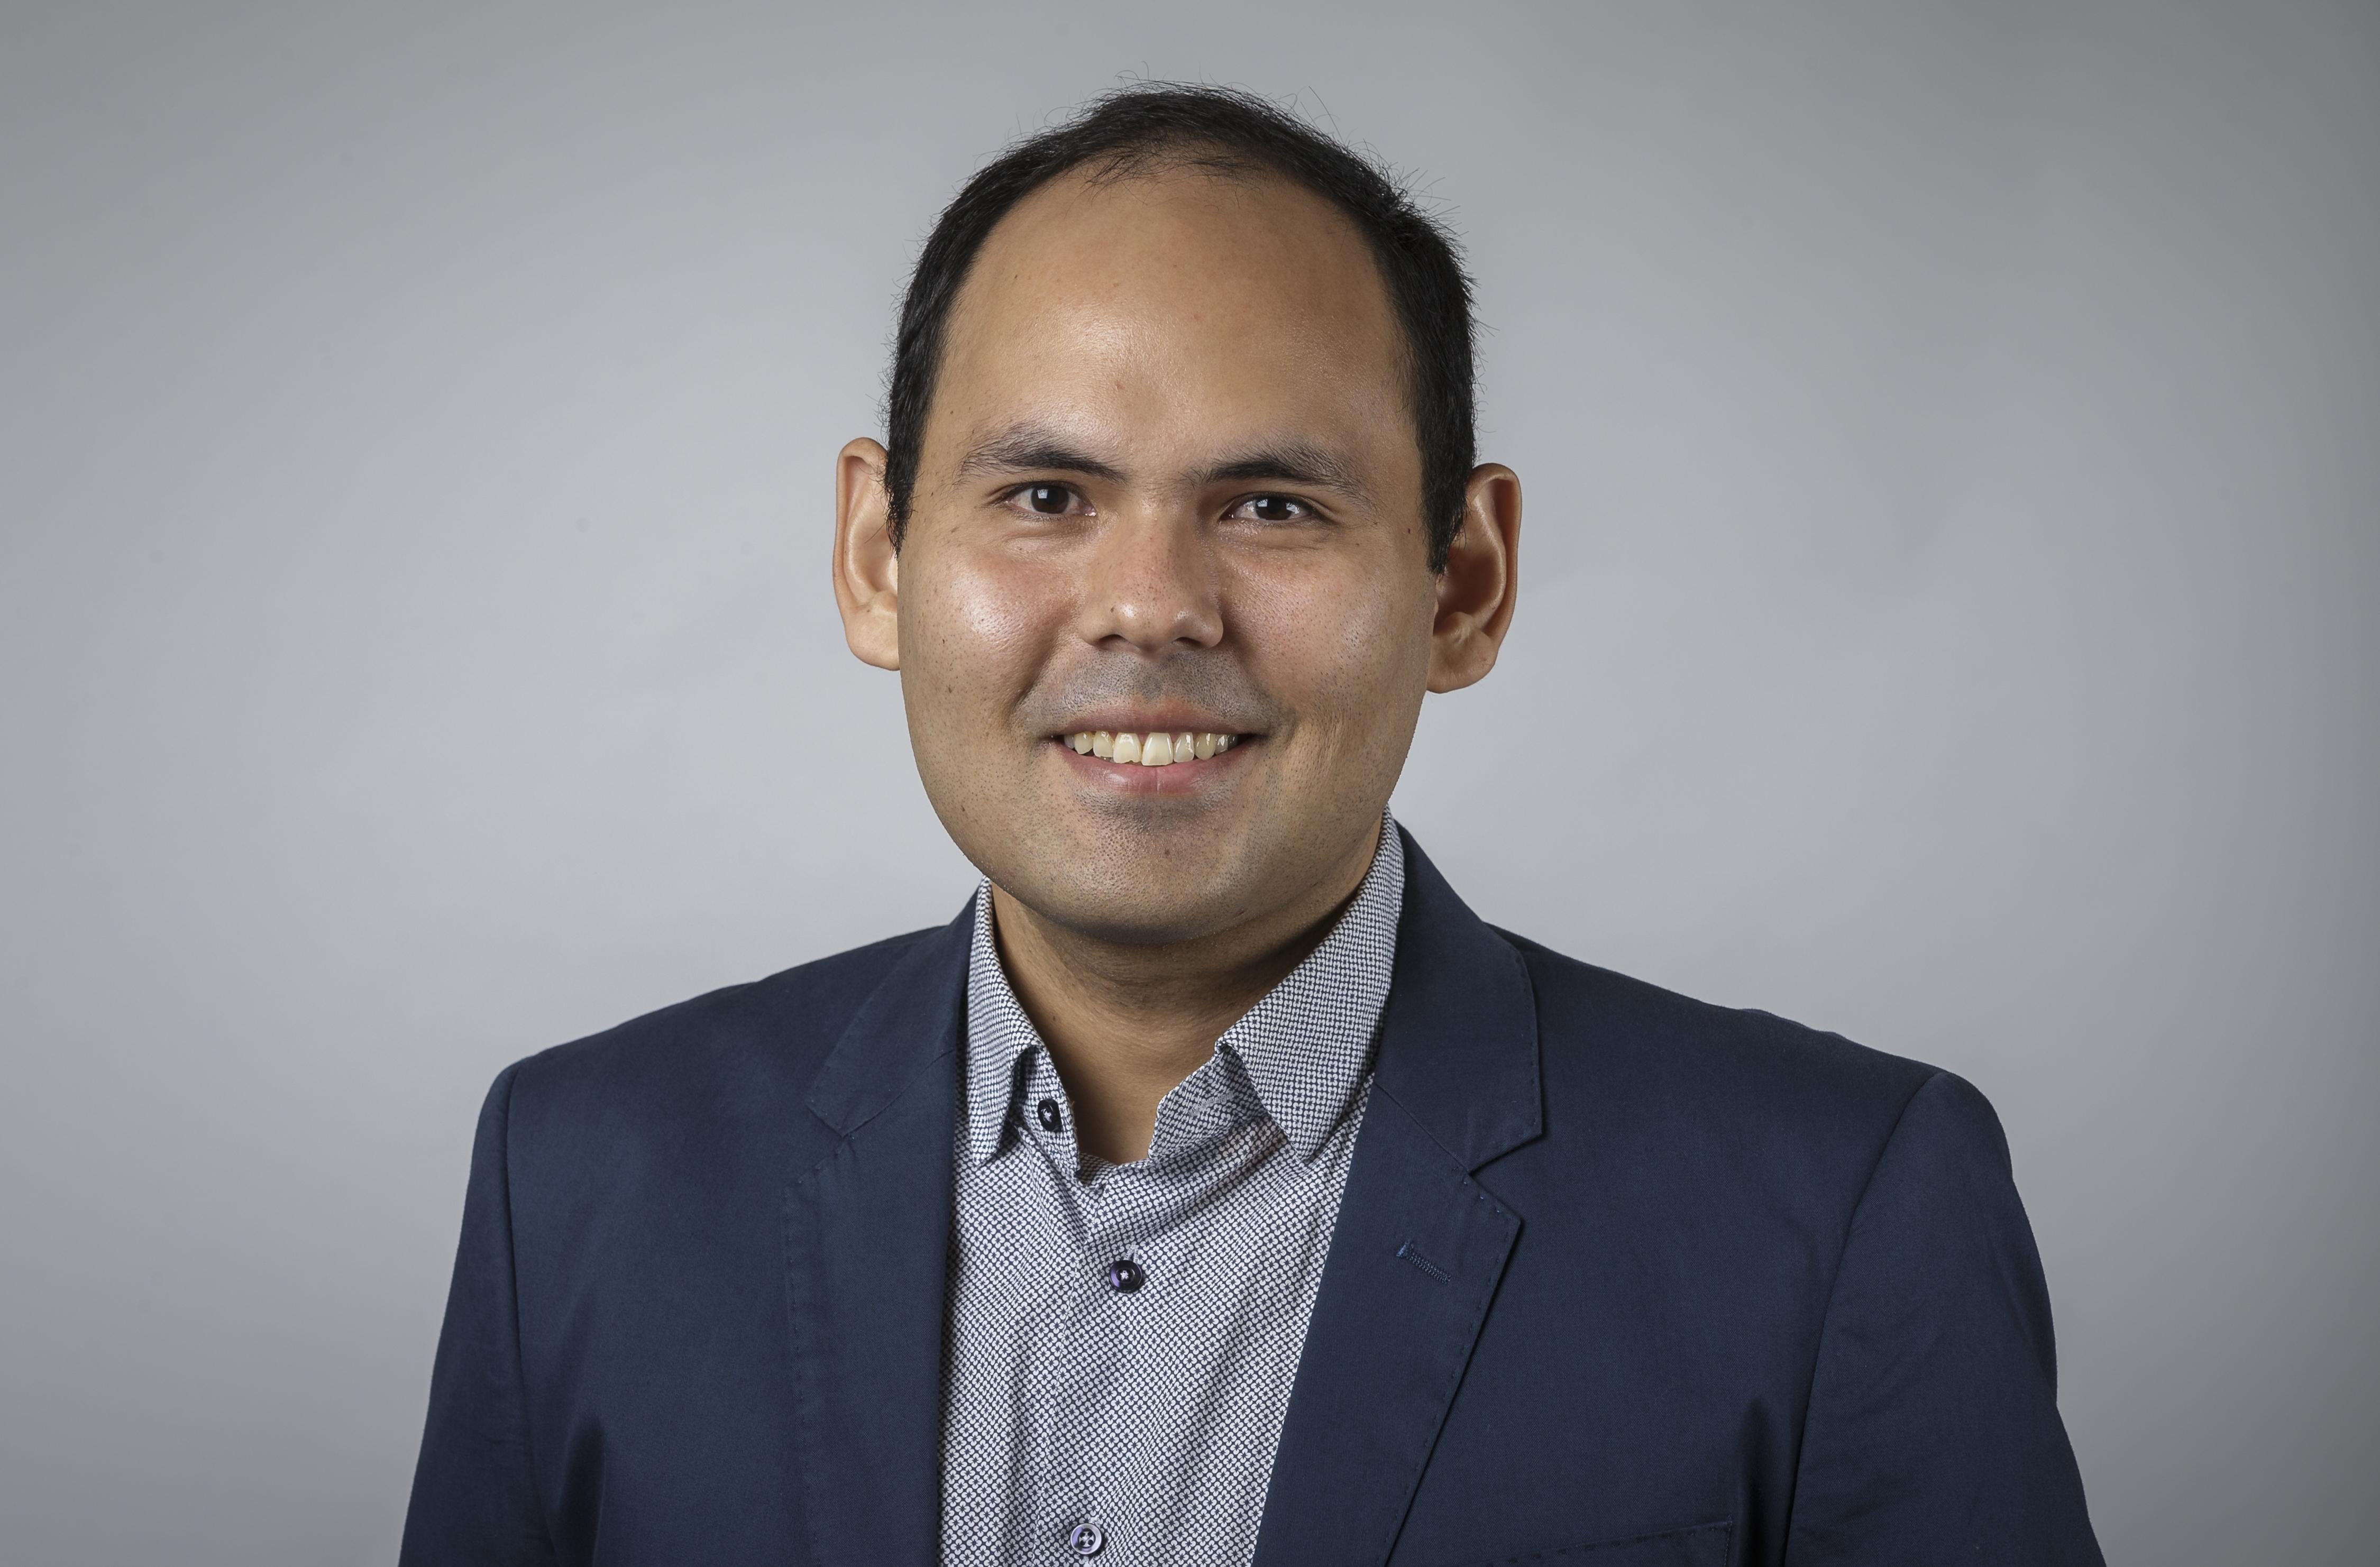 Carlos Bartesaghi Koc